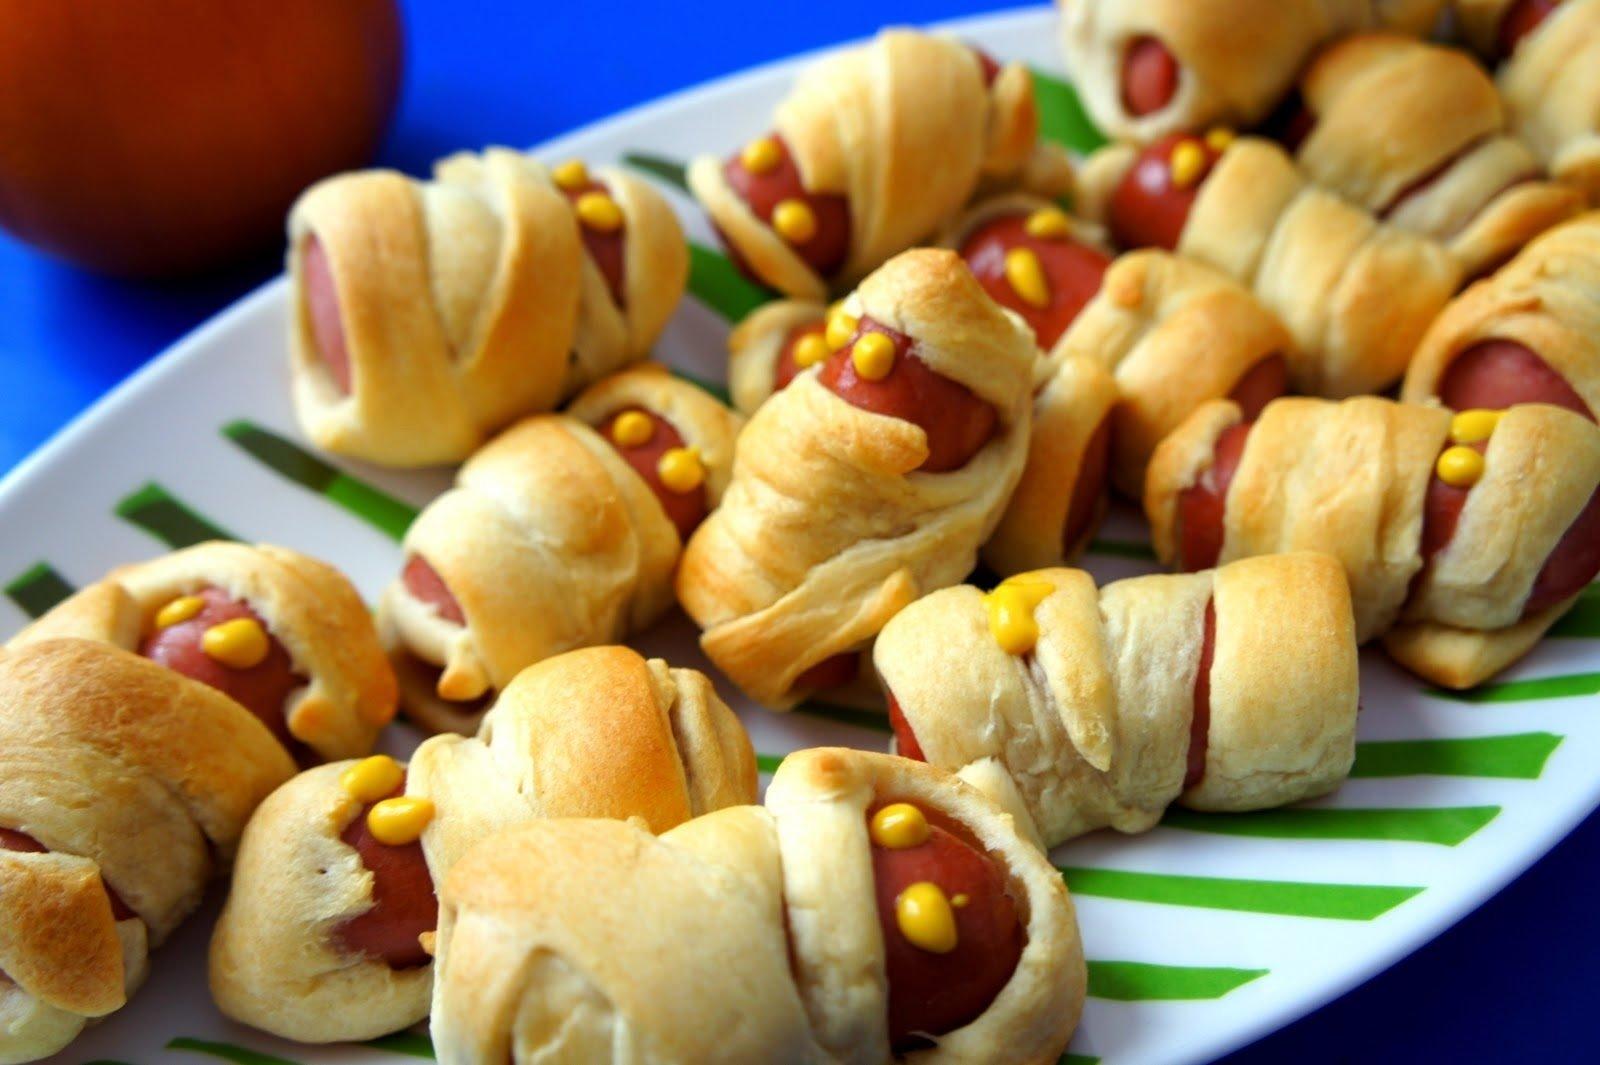 10 Cute Halloween Treat Ideas For Kids halloween party food ideas children halloween articles halloween 2 2020